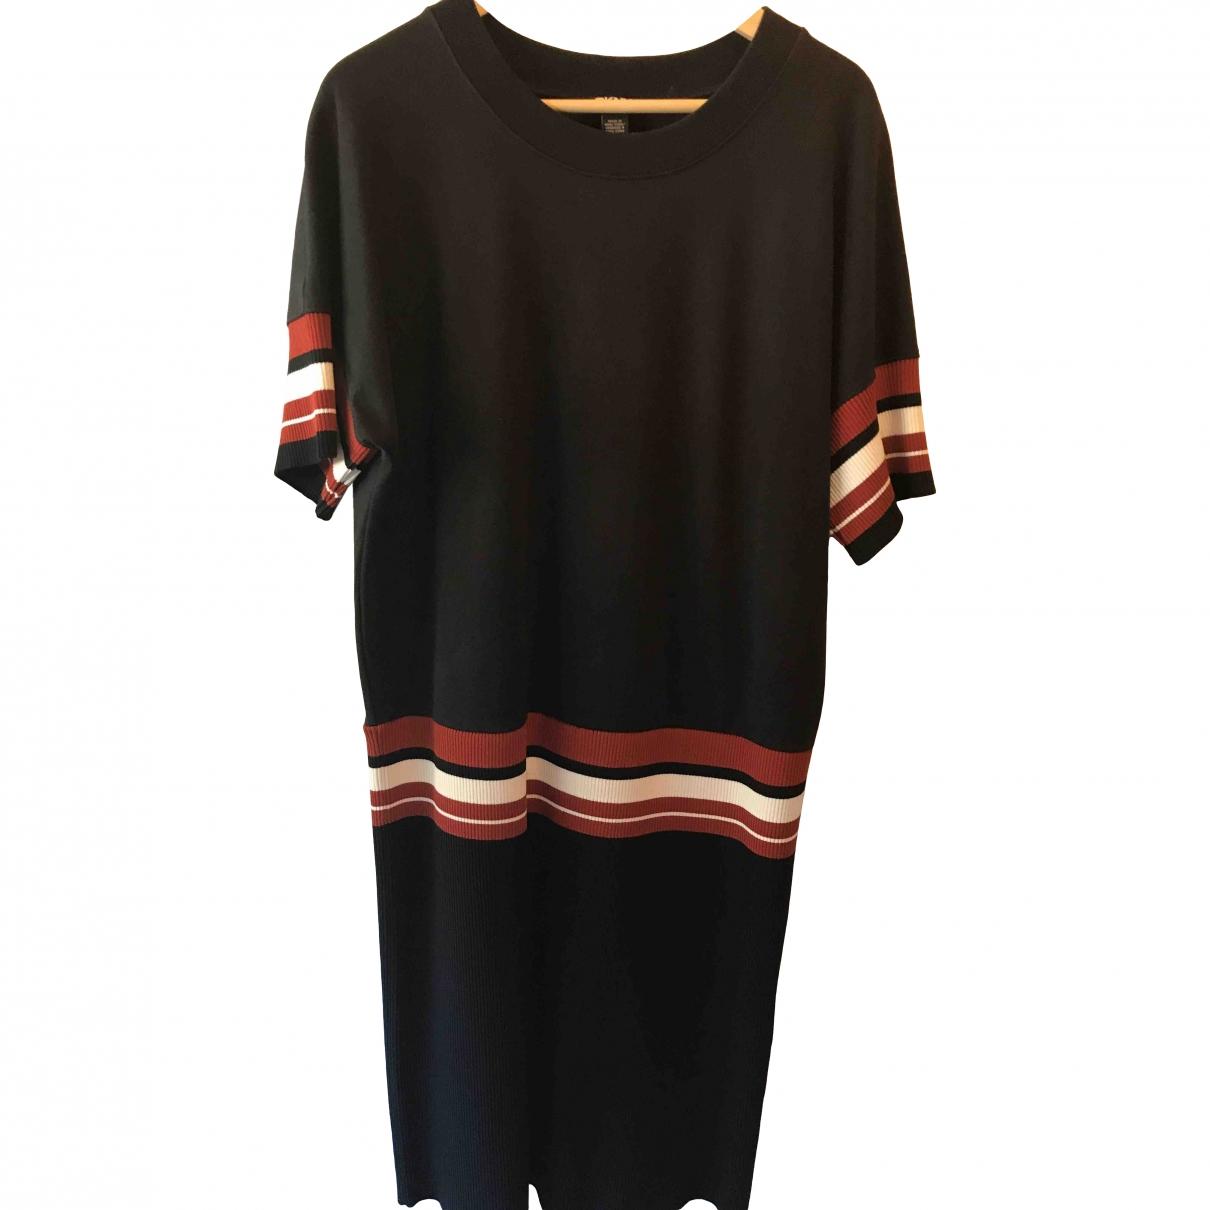 Dkny \N Black Cotton - elasthane dress for Women L International